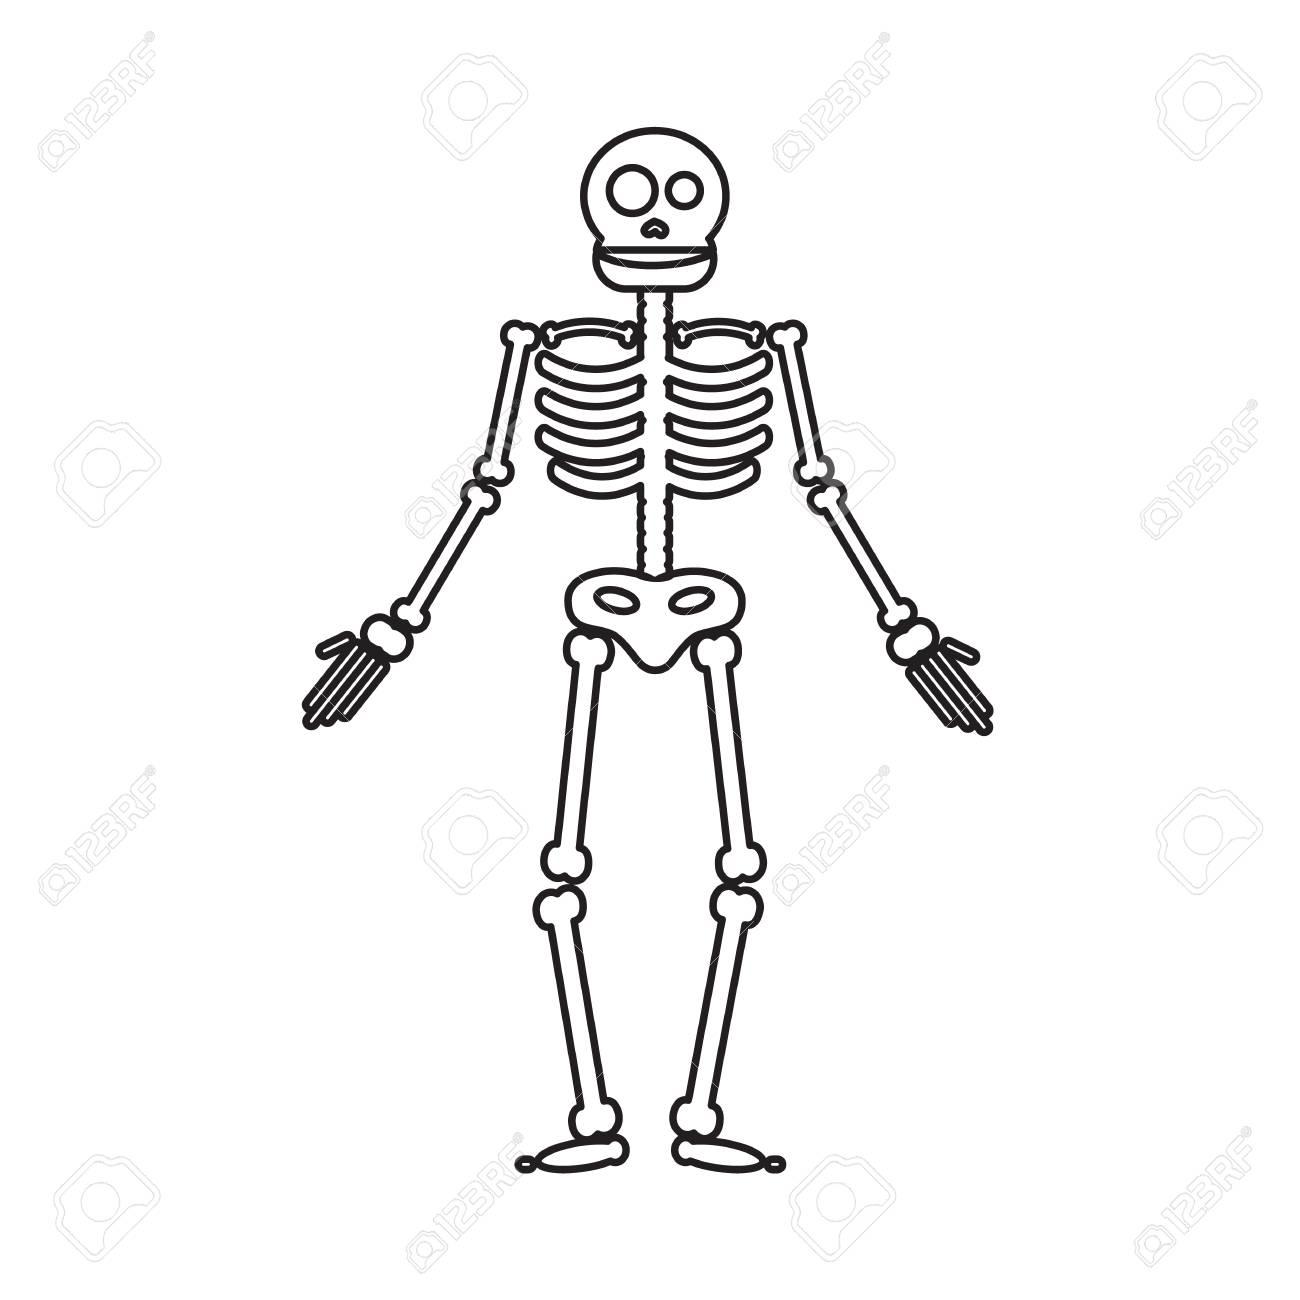 Halloween Skeleton.Happy Halloween Skeleton Illustration Zombie From Bones And